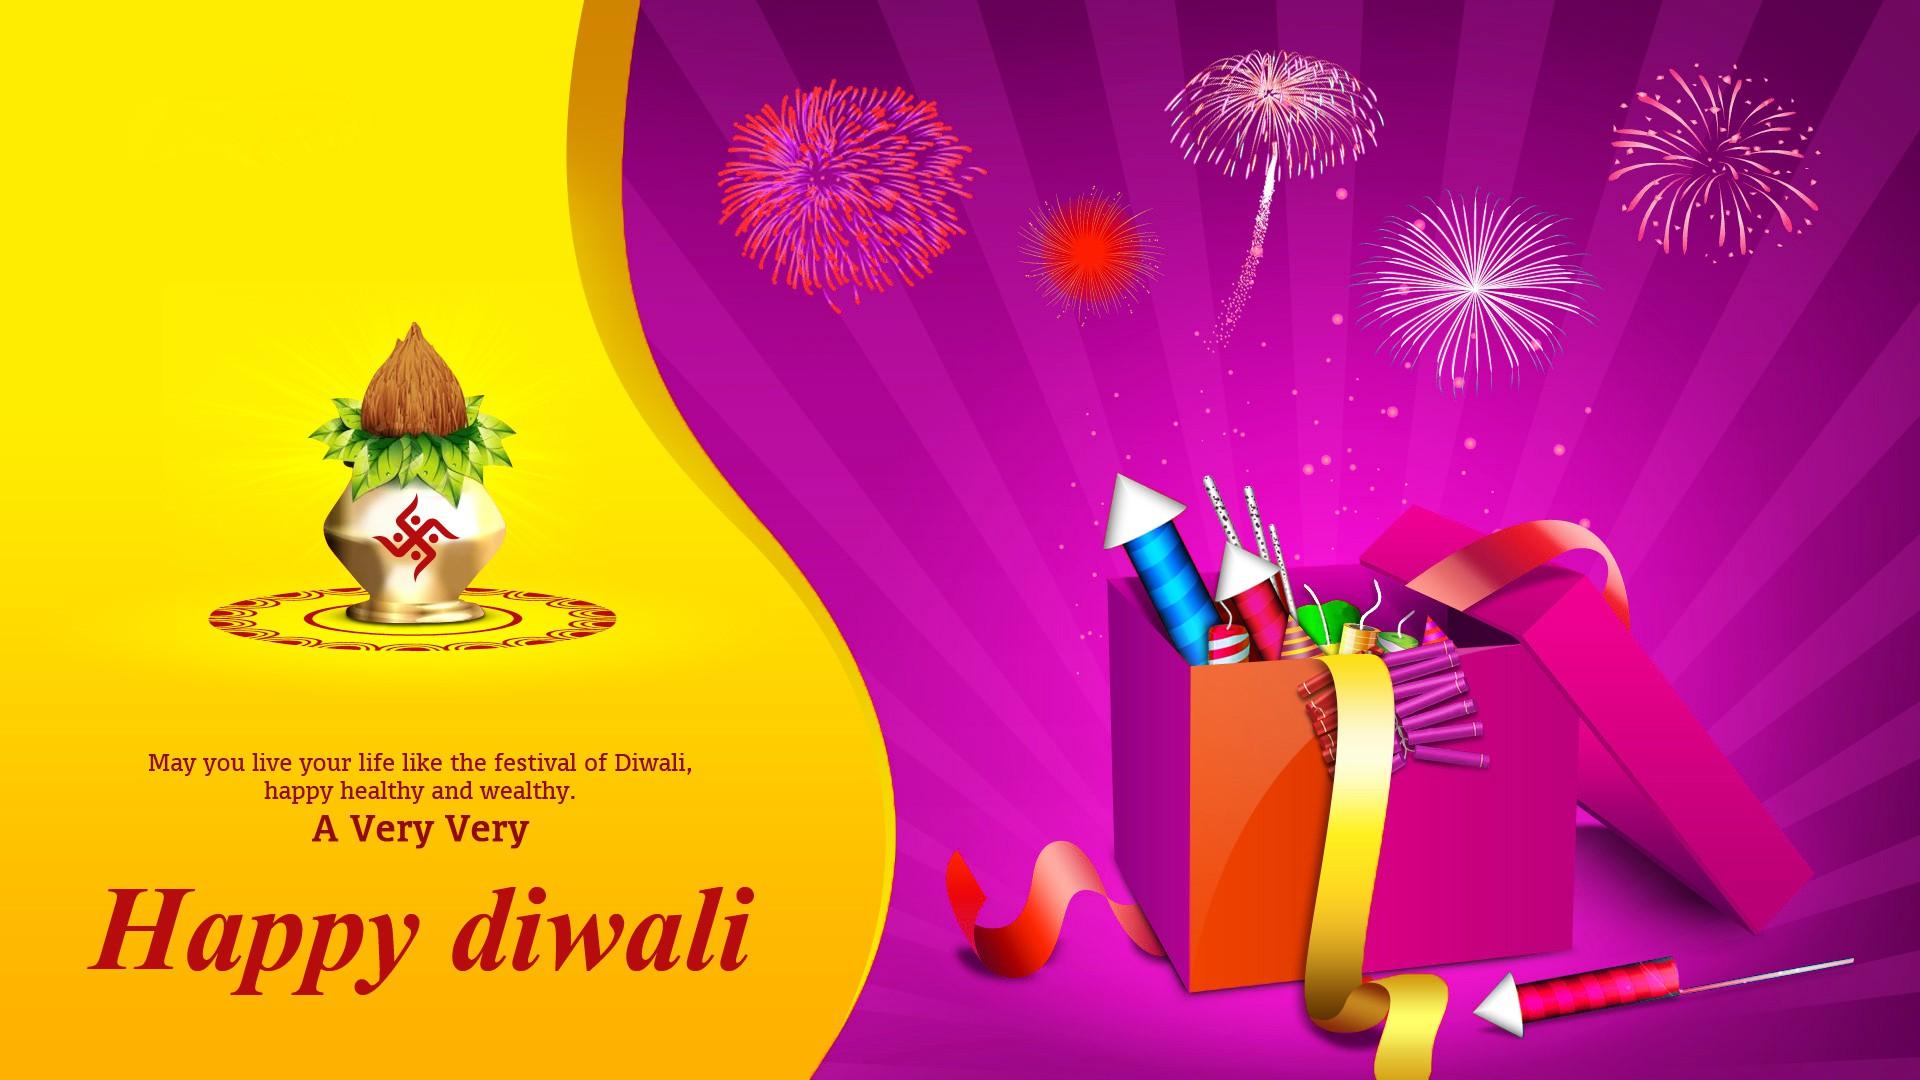 Diwali Shayari In Hindi Hindi Shayari Whatsapp Status In Hindi